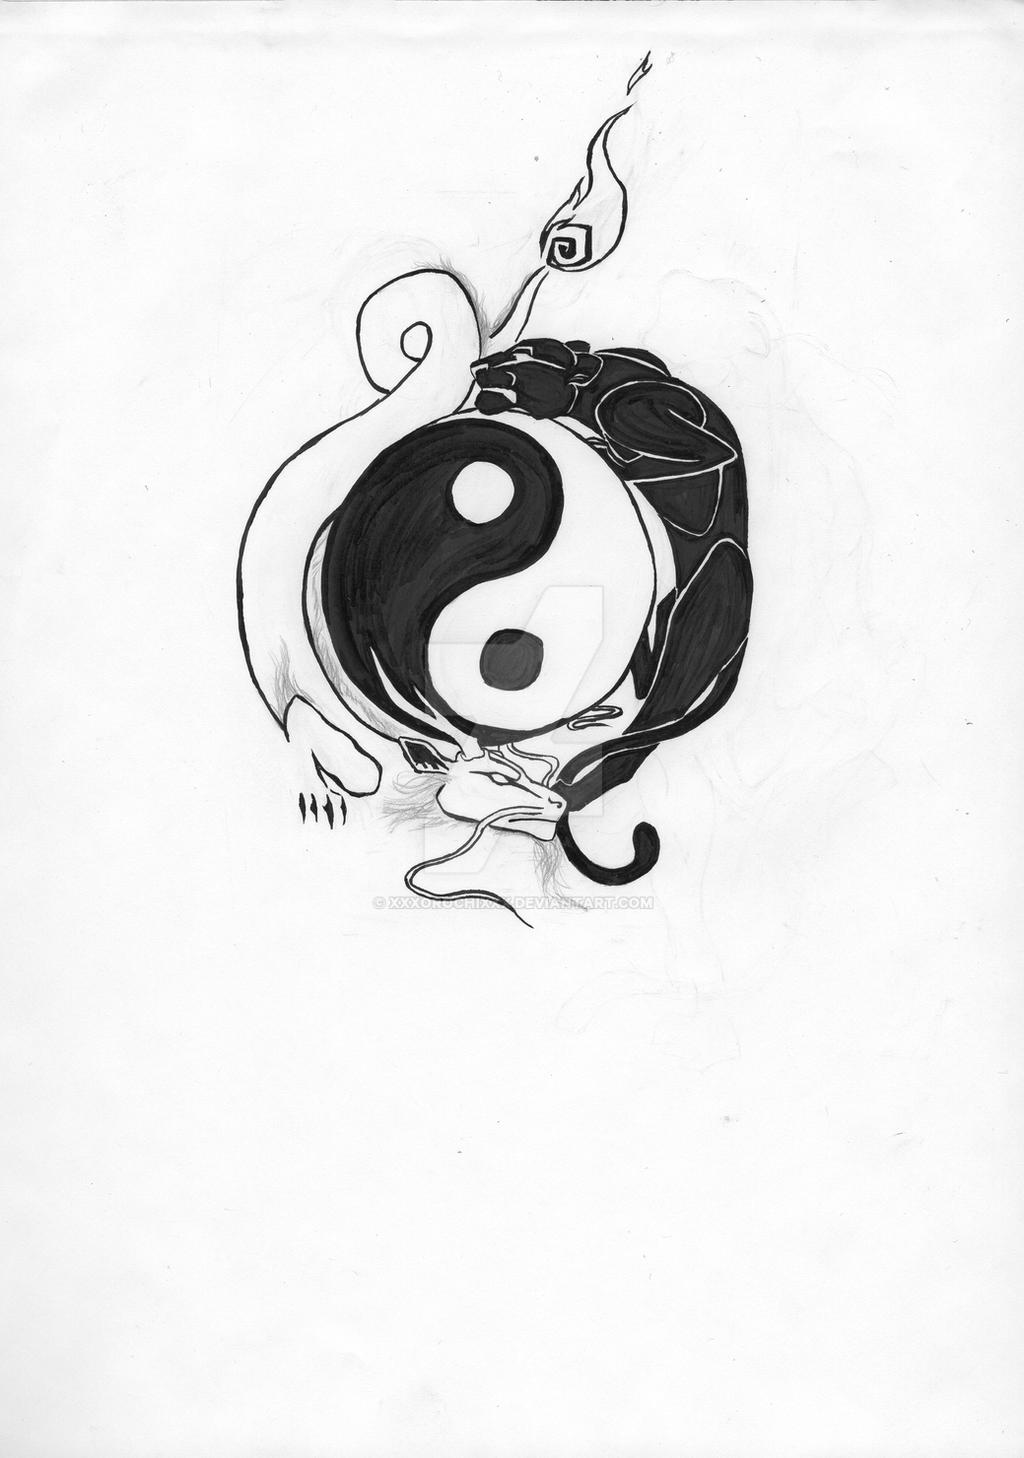 jin jang tattoo by xxxorochixxx on deviantart